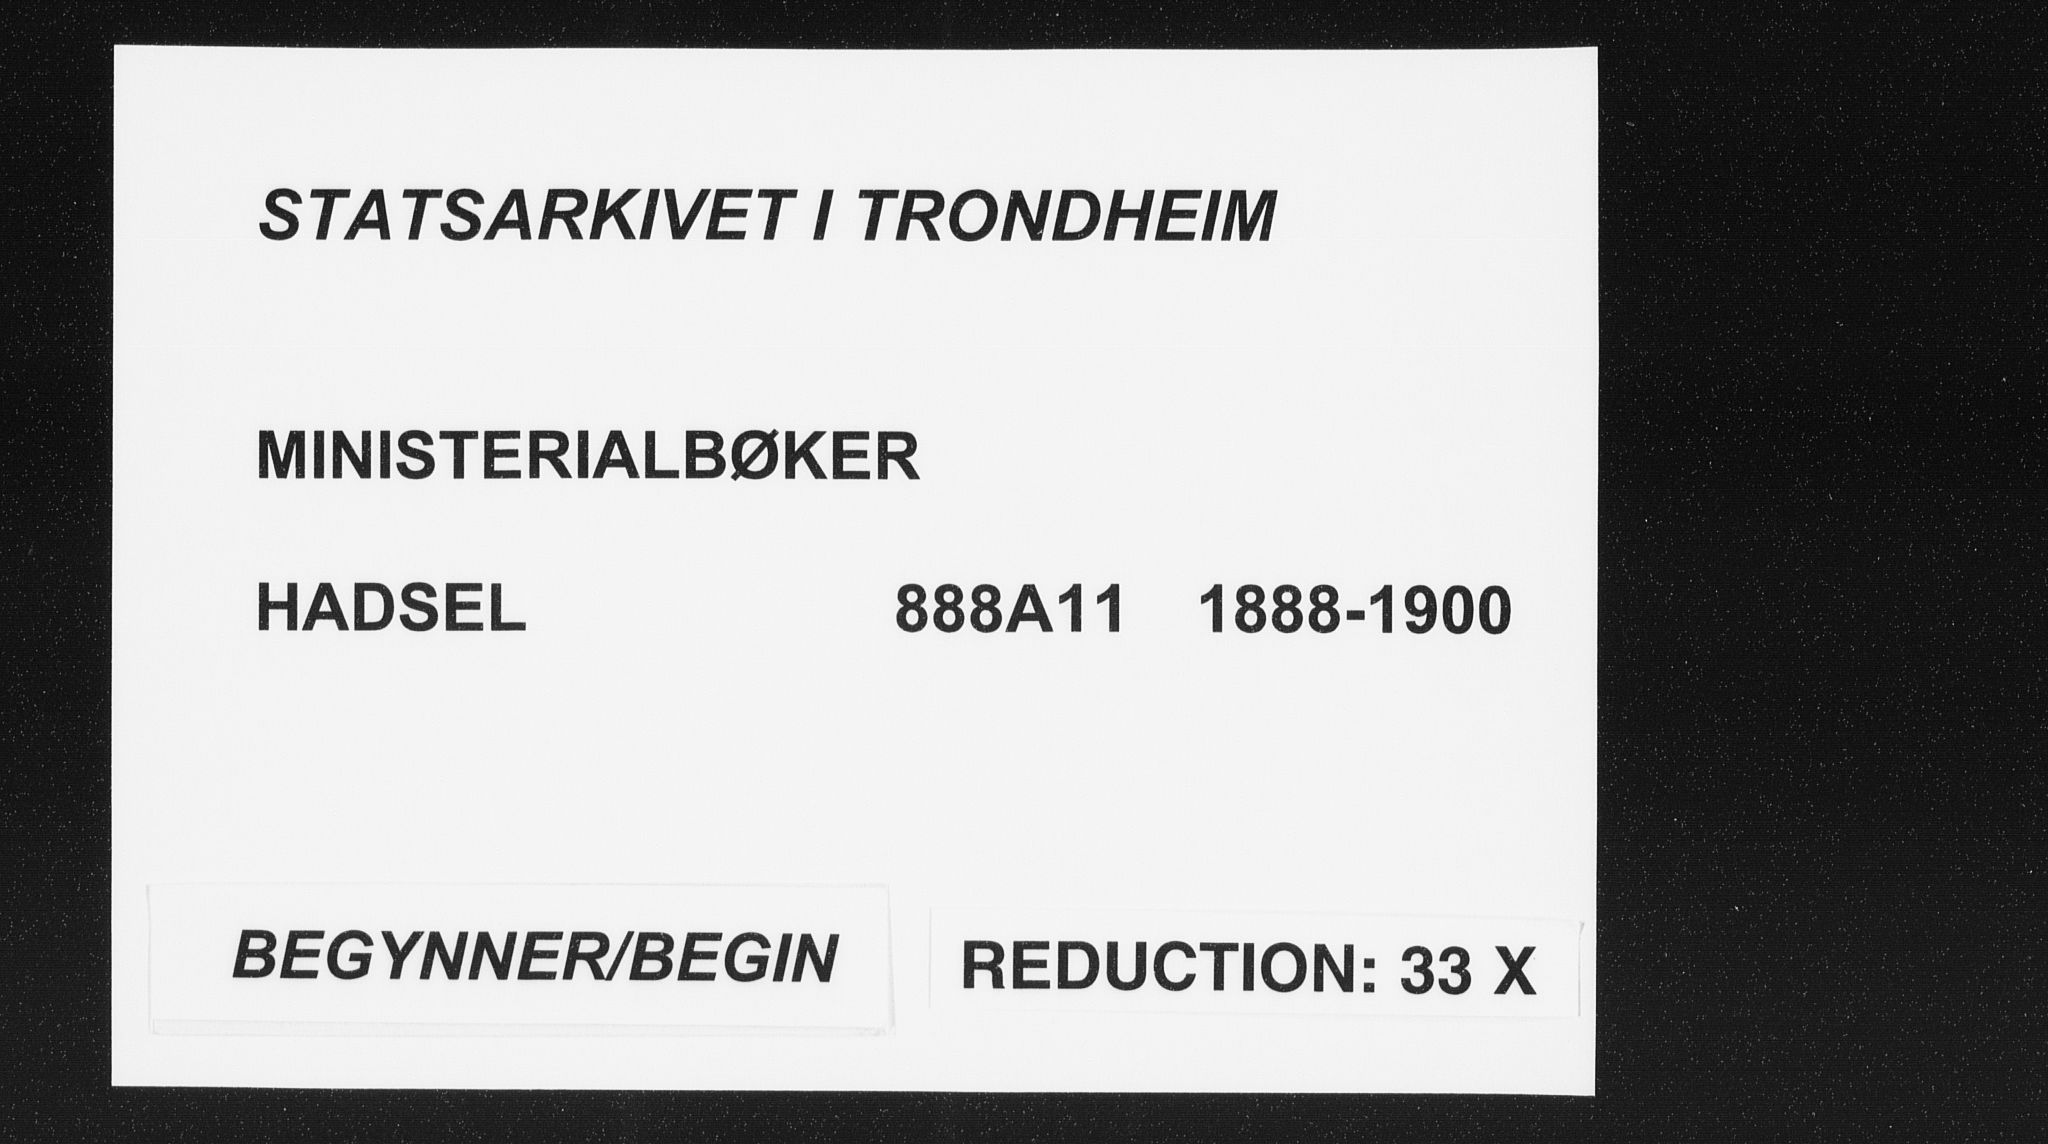 SAT, Ministerialprotokoller, klokkerbøker og fødselsregistre - Nordland, 888/L1245: Ministerialbok nr. 888A11, 1888-1900